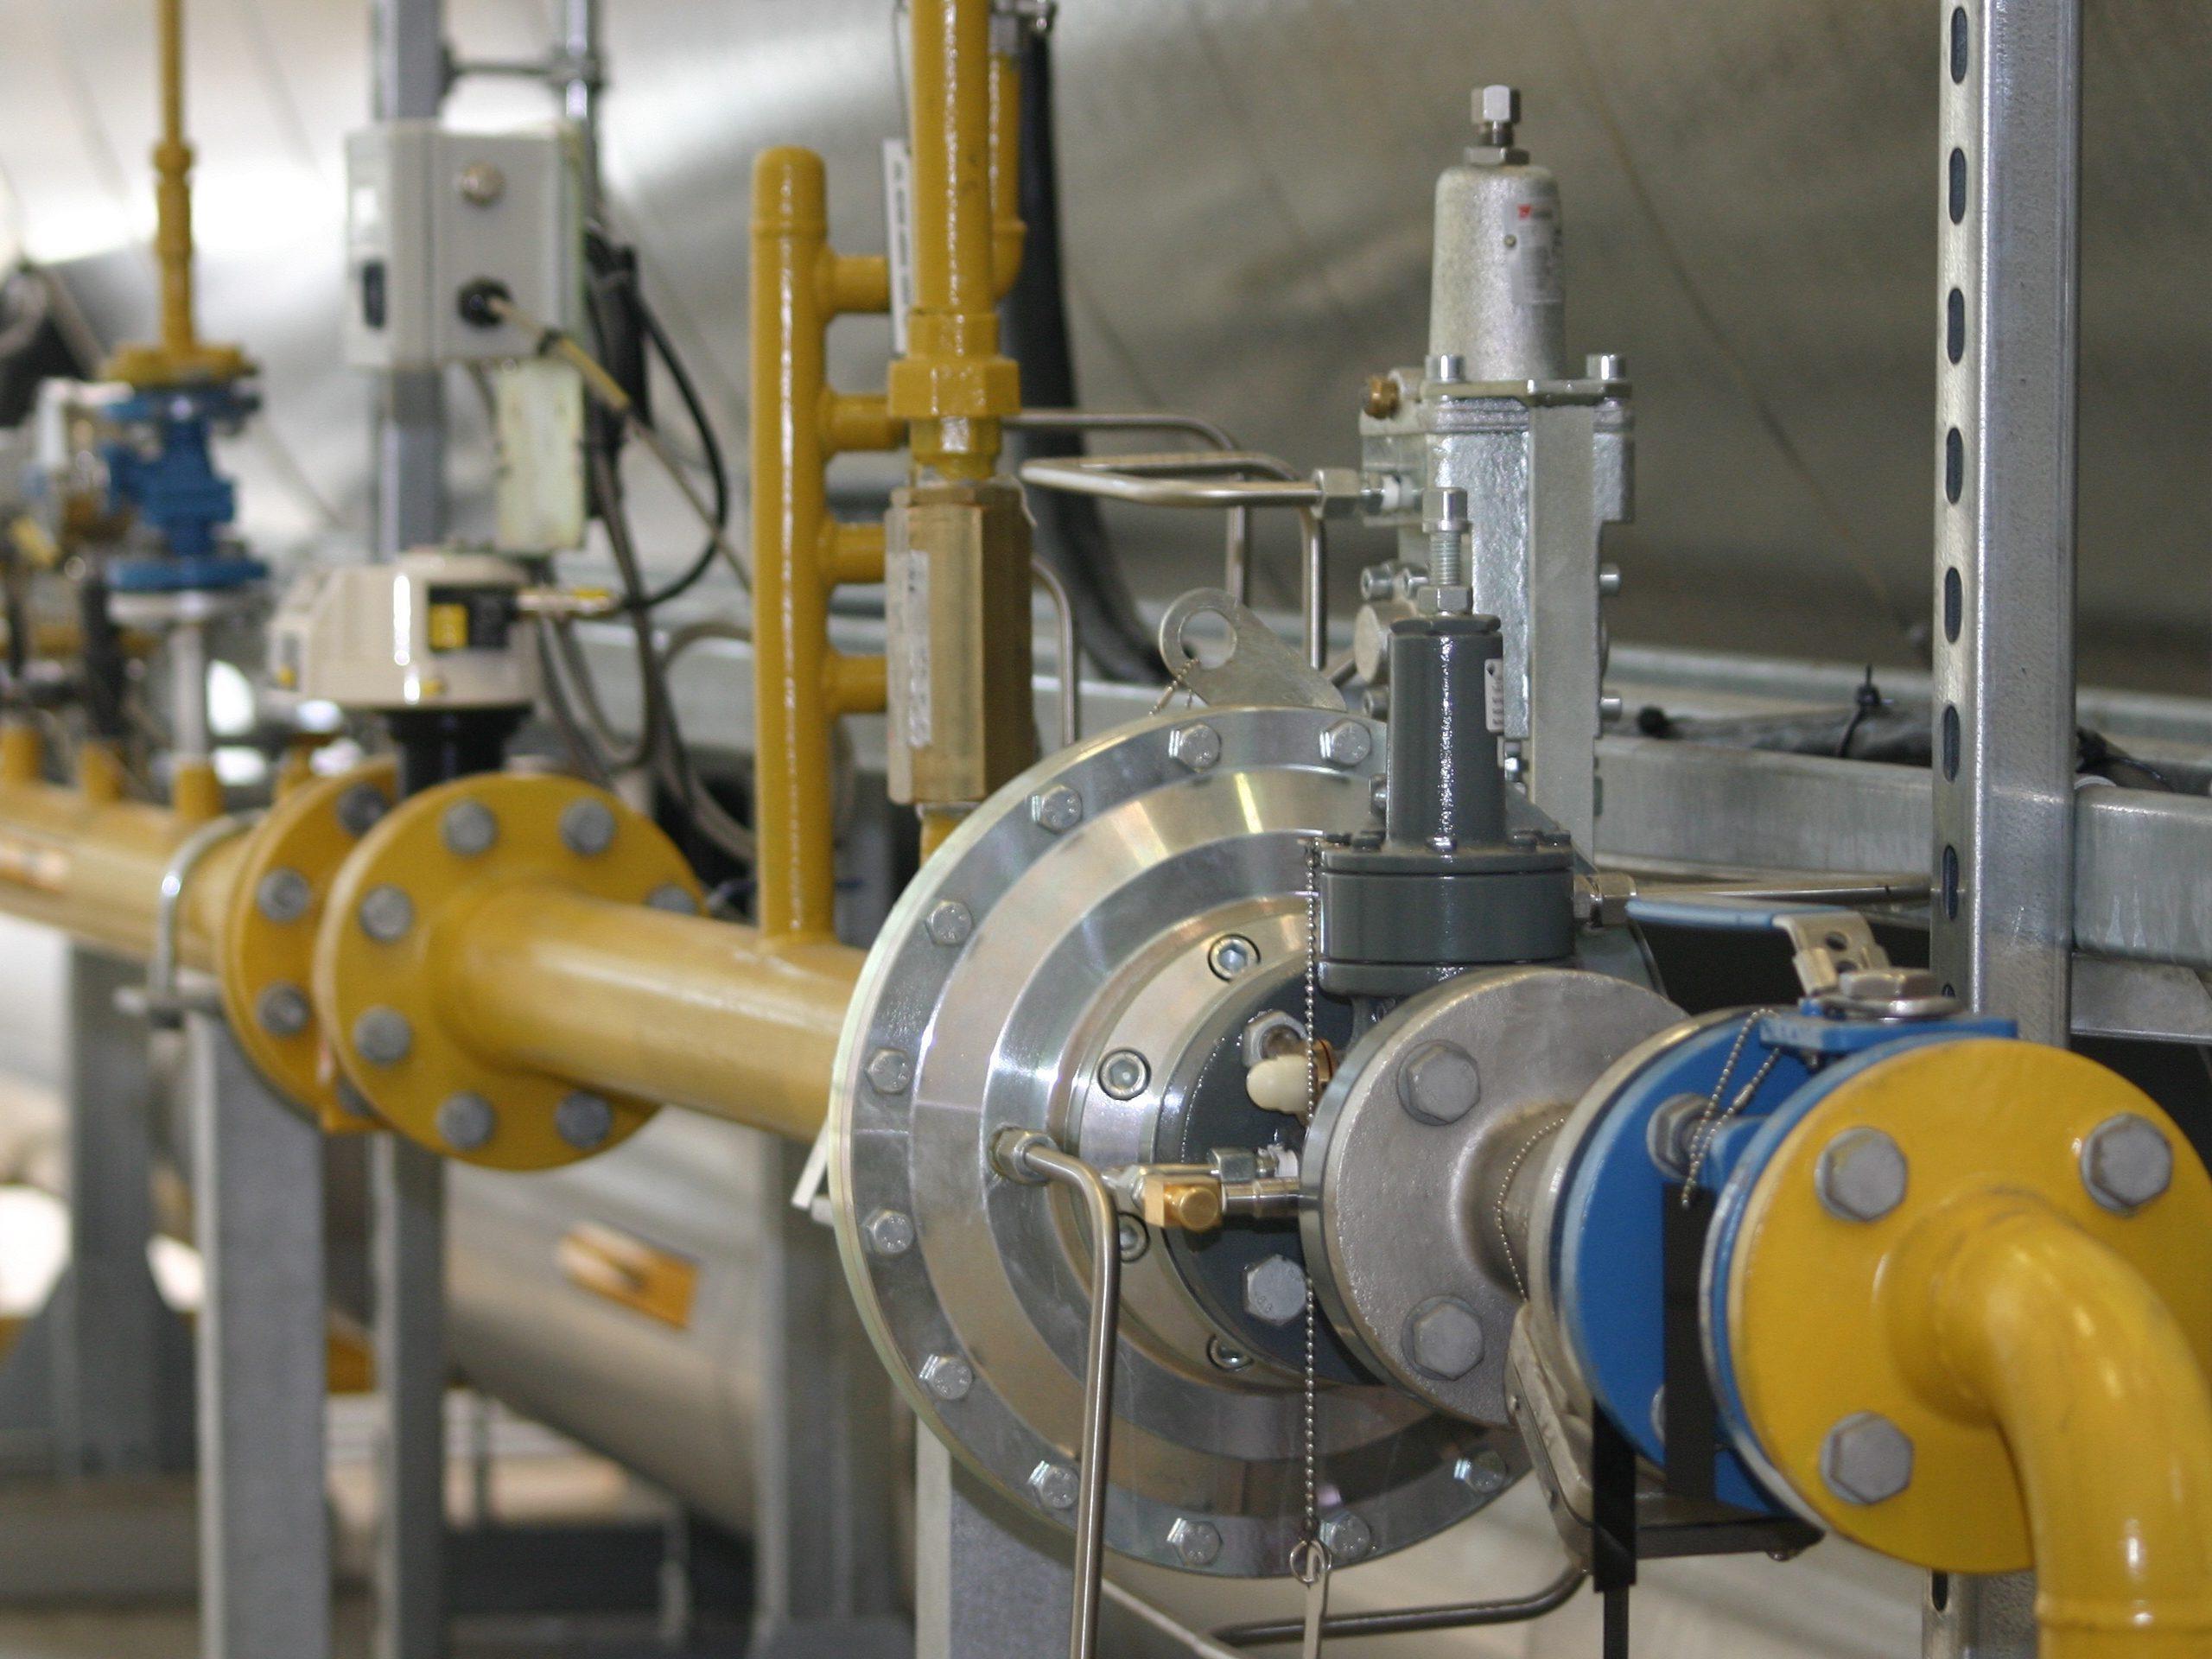 Gasleiding inspectie (scope 7)